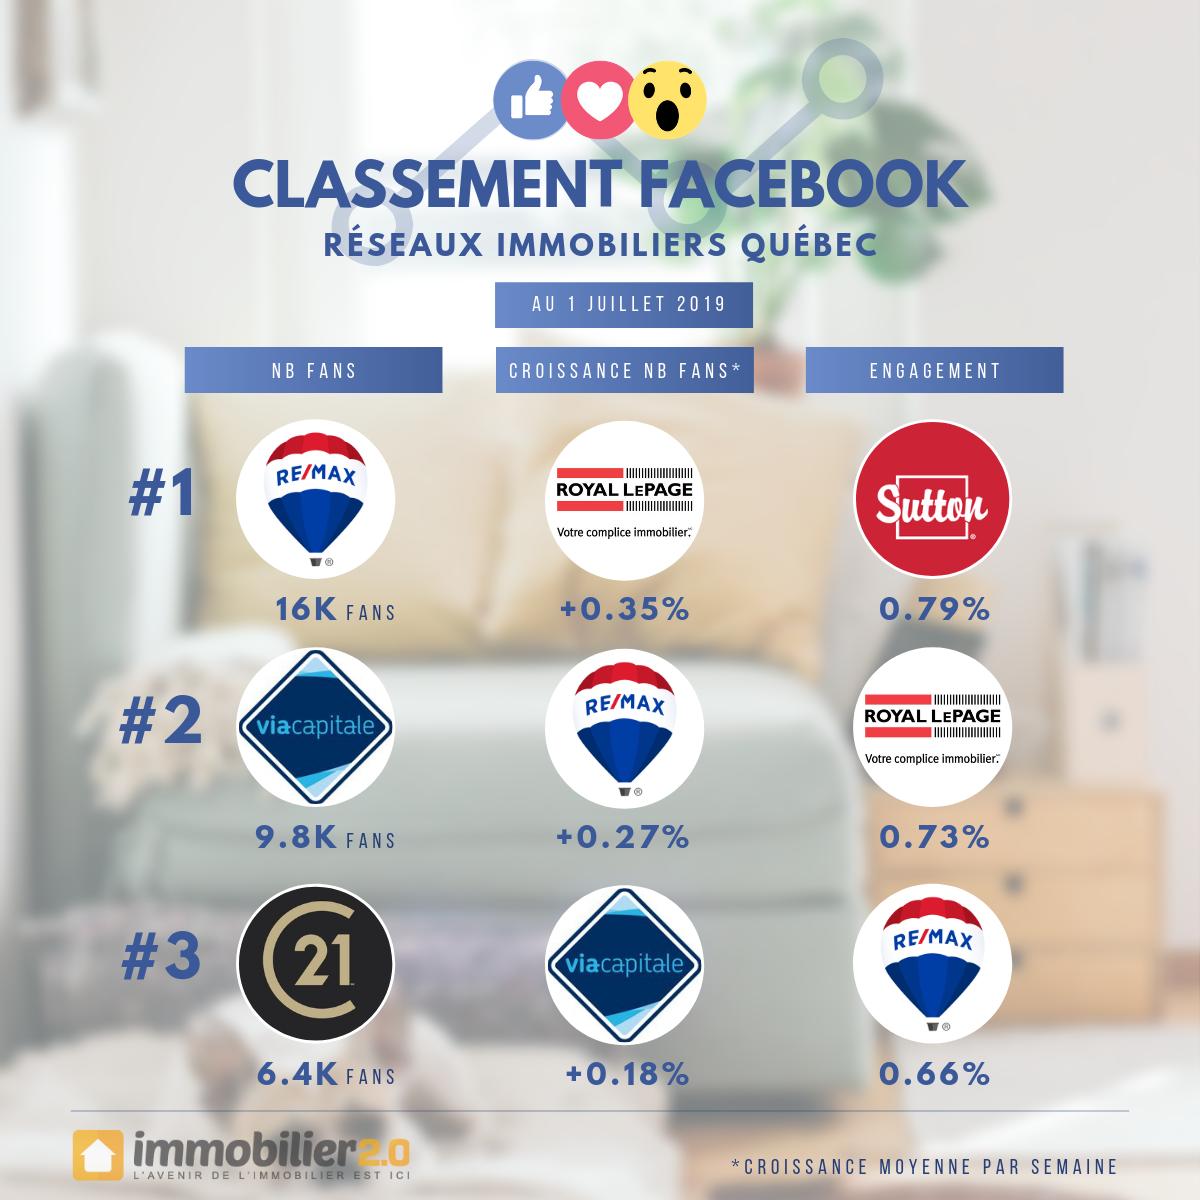 Classement Facebook Marques Immobiliers Quebec Juillet 2019